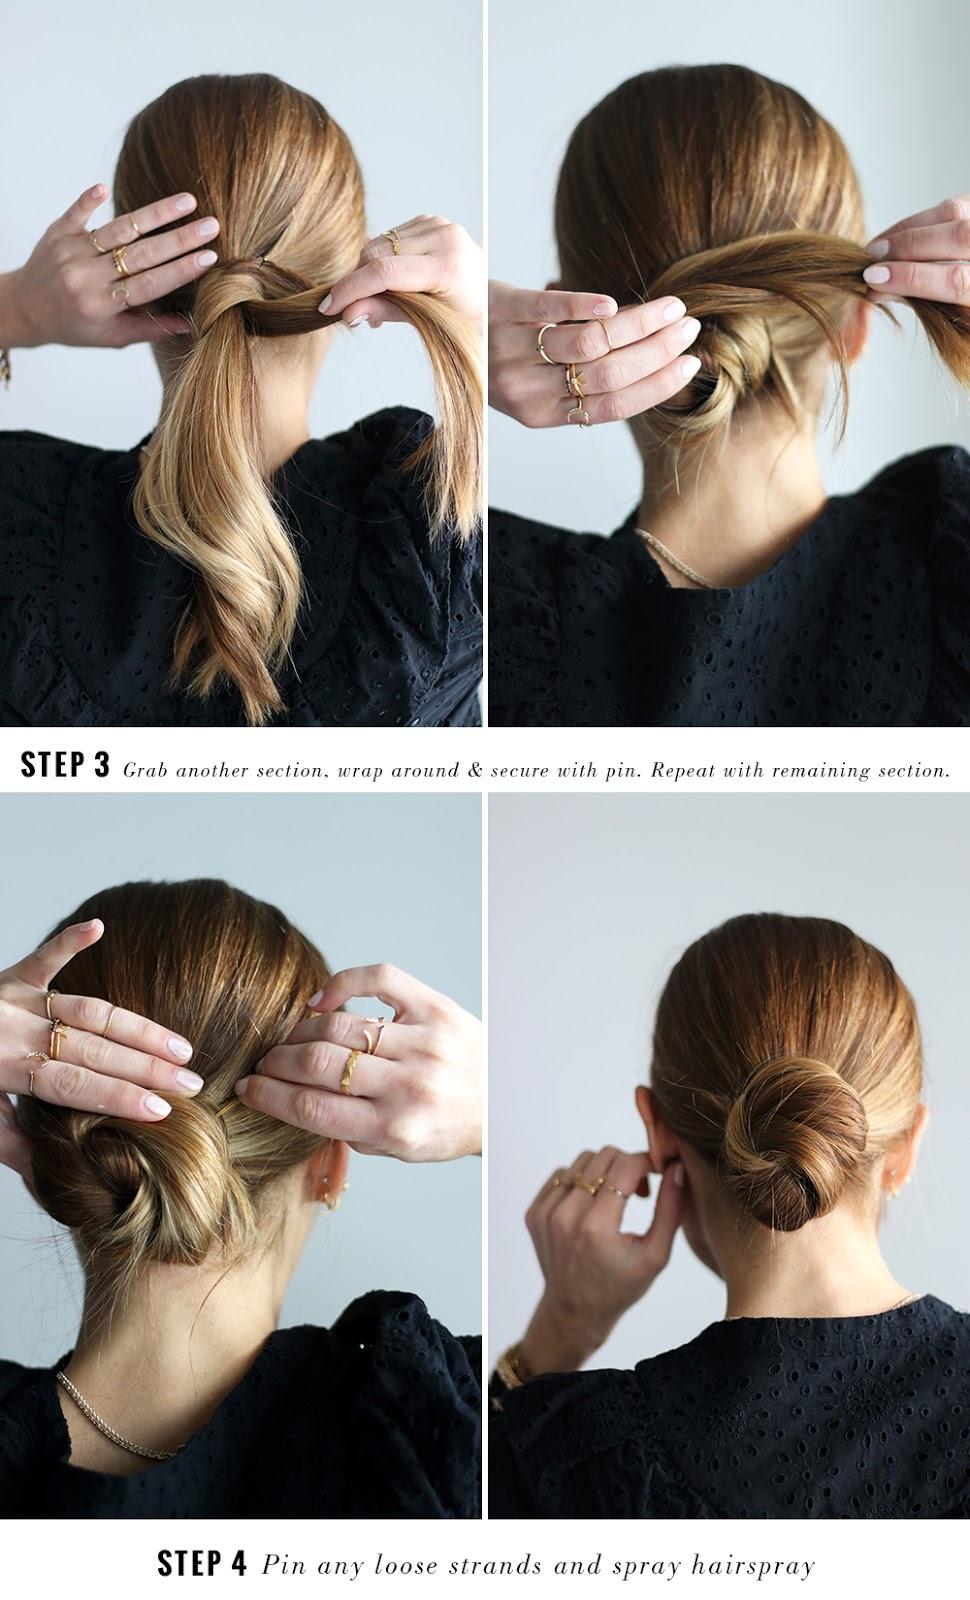 DIY File The Easiest Hair Bun Tutorial THE VAULT FILES - Hairstyle bun tutorials